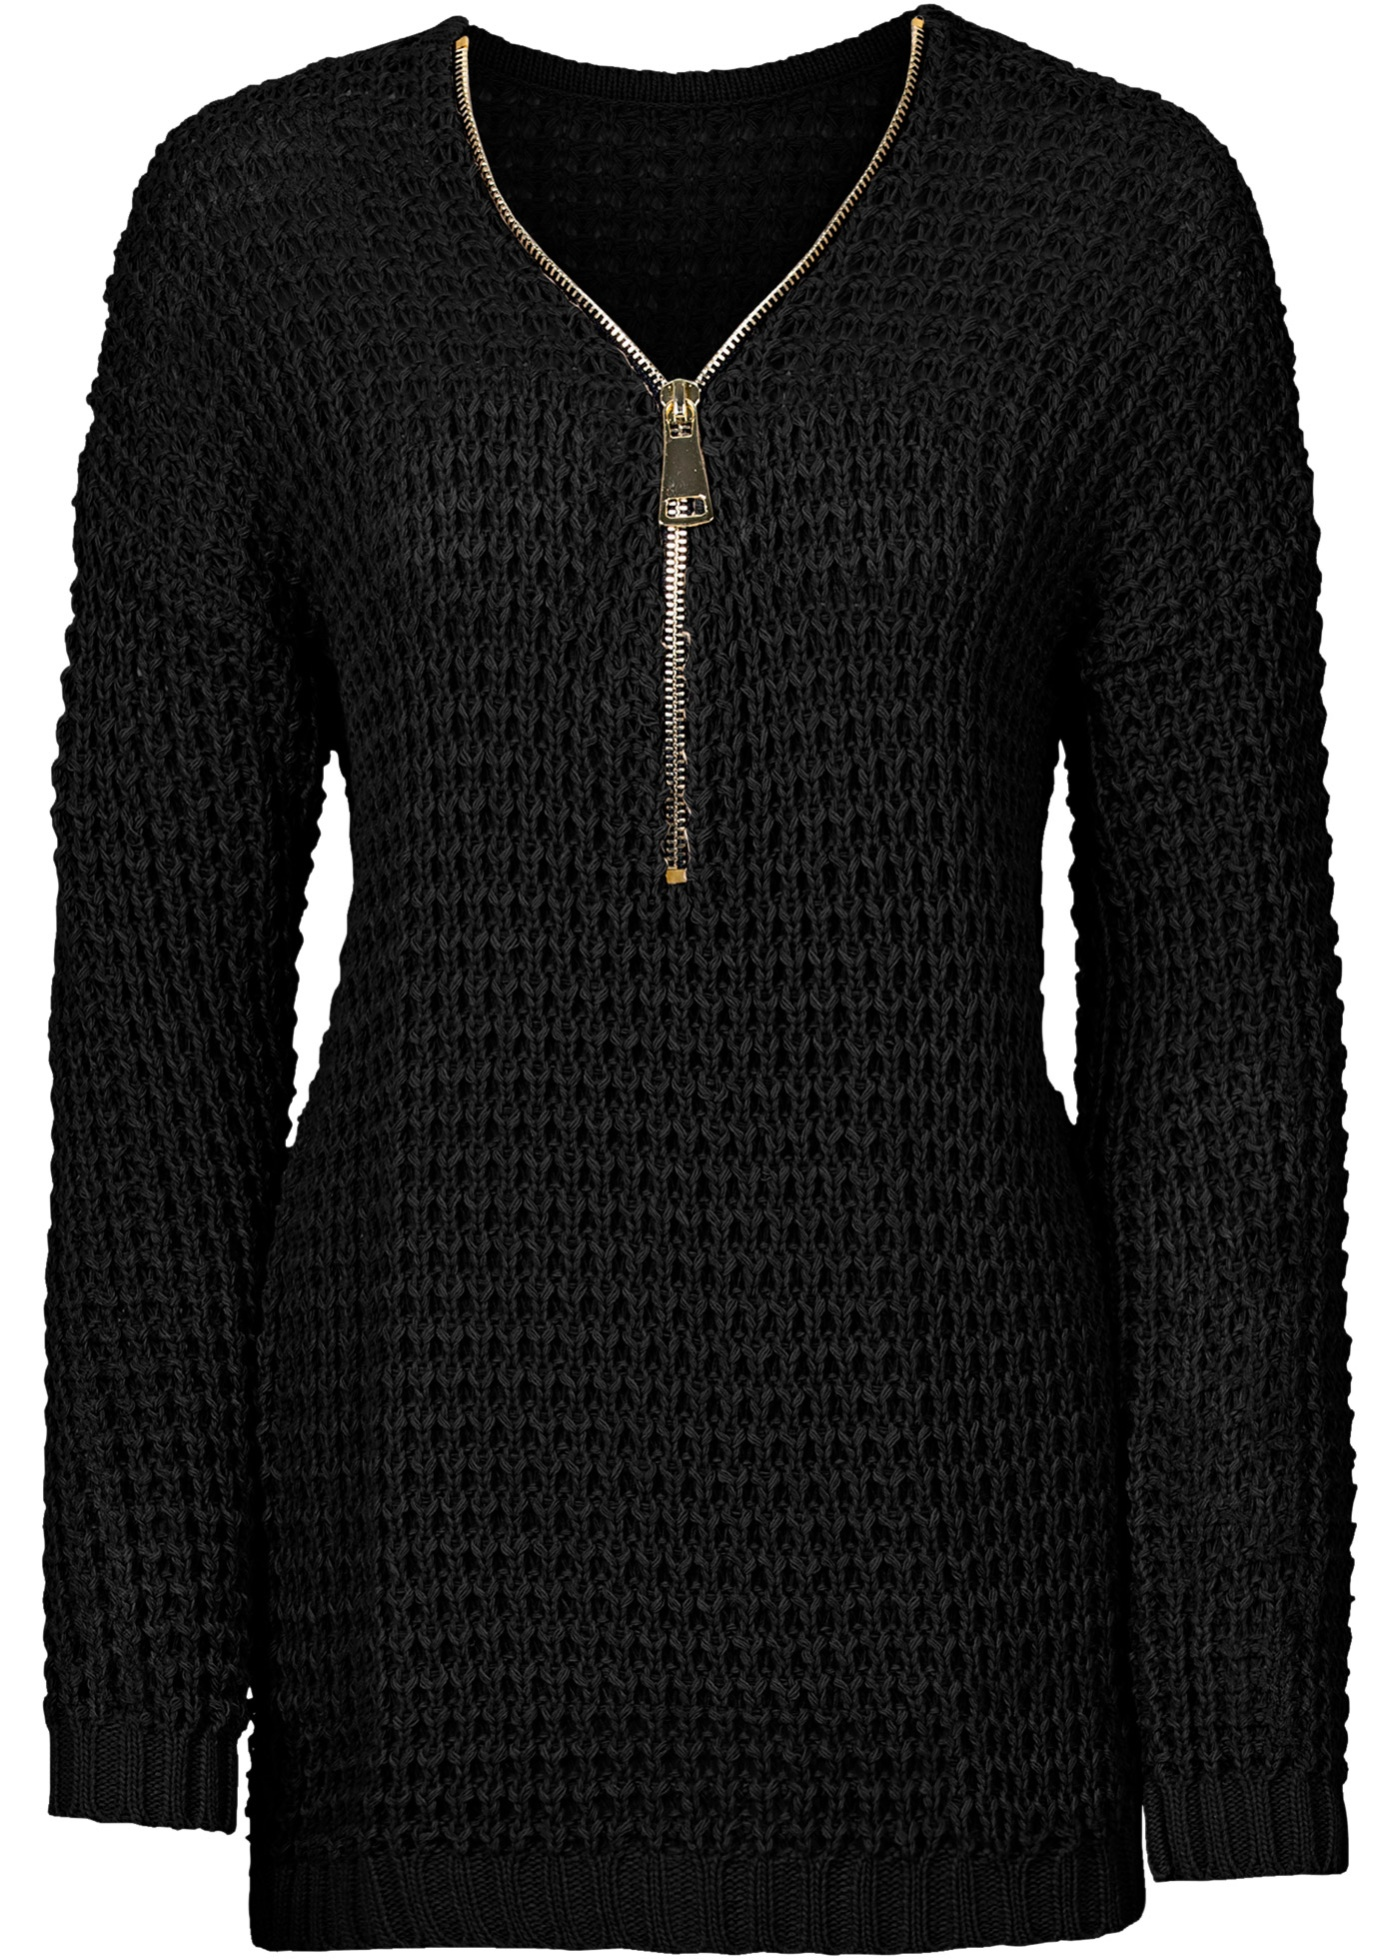 Bonprix SE - Stickad tröja med dragkedja 279.00